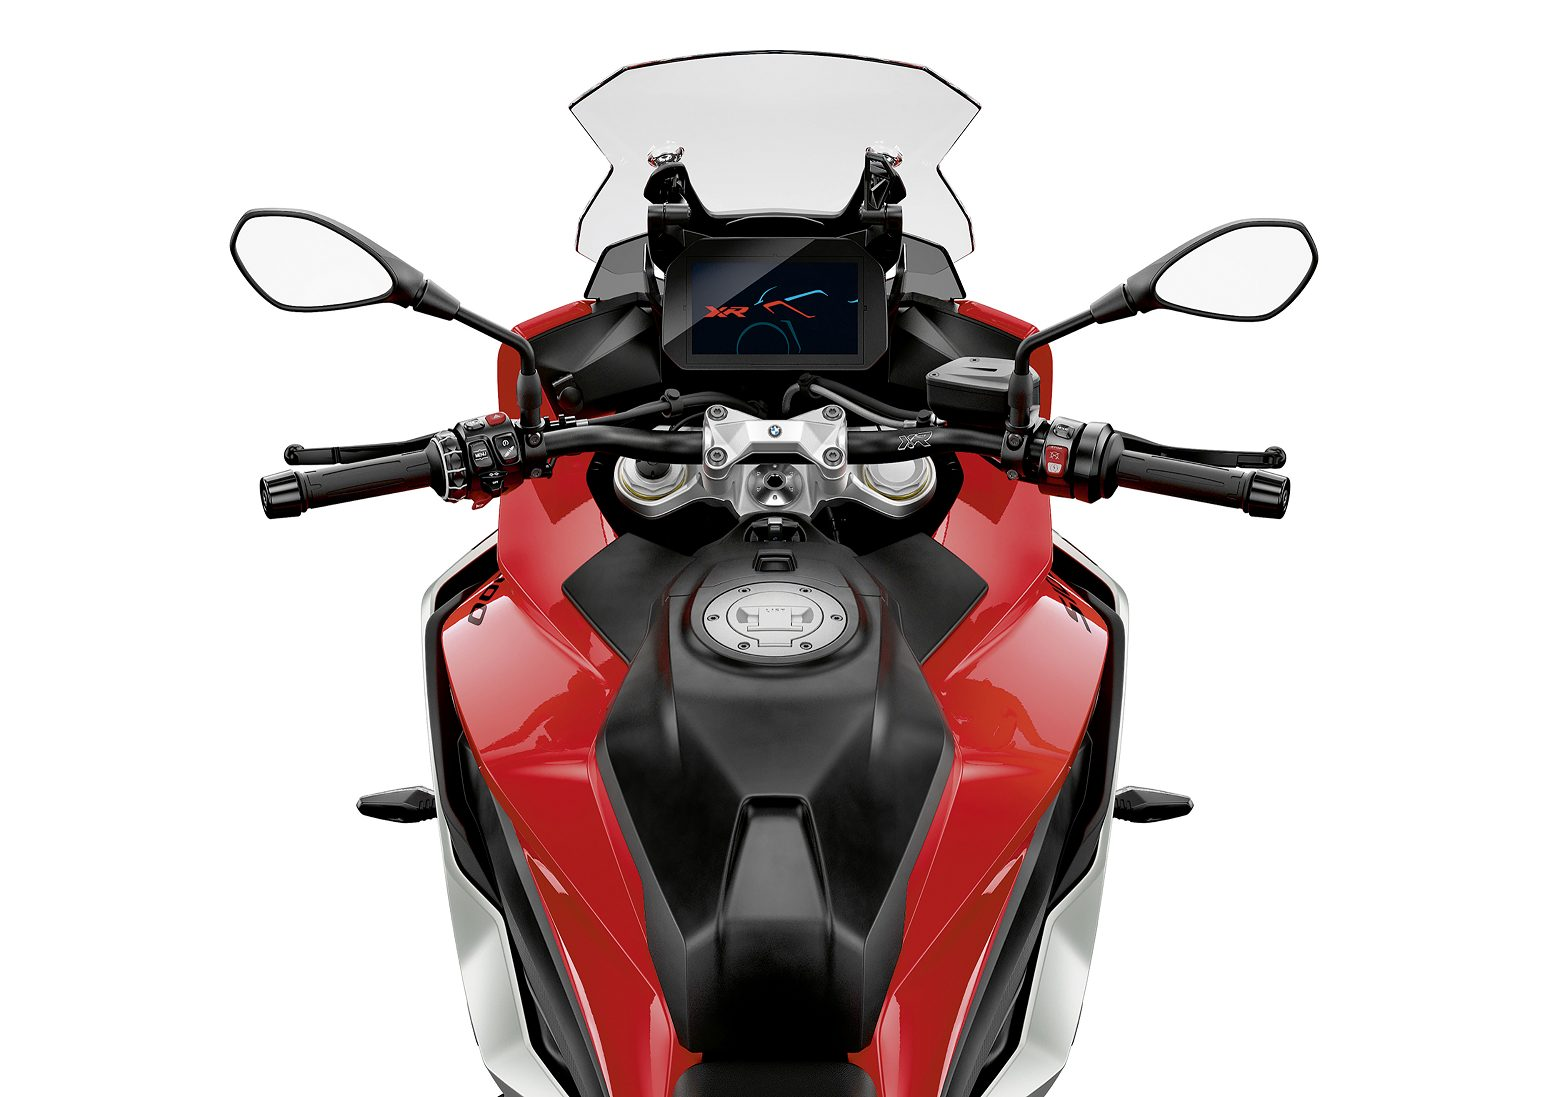 2021-BMW-S-1000-XR-Red-White-Tank